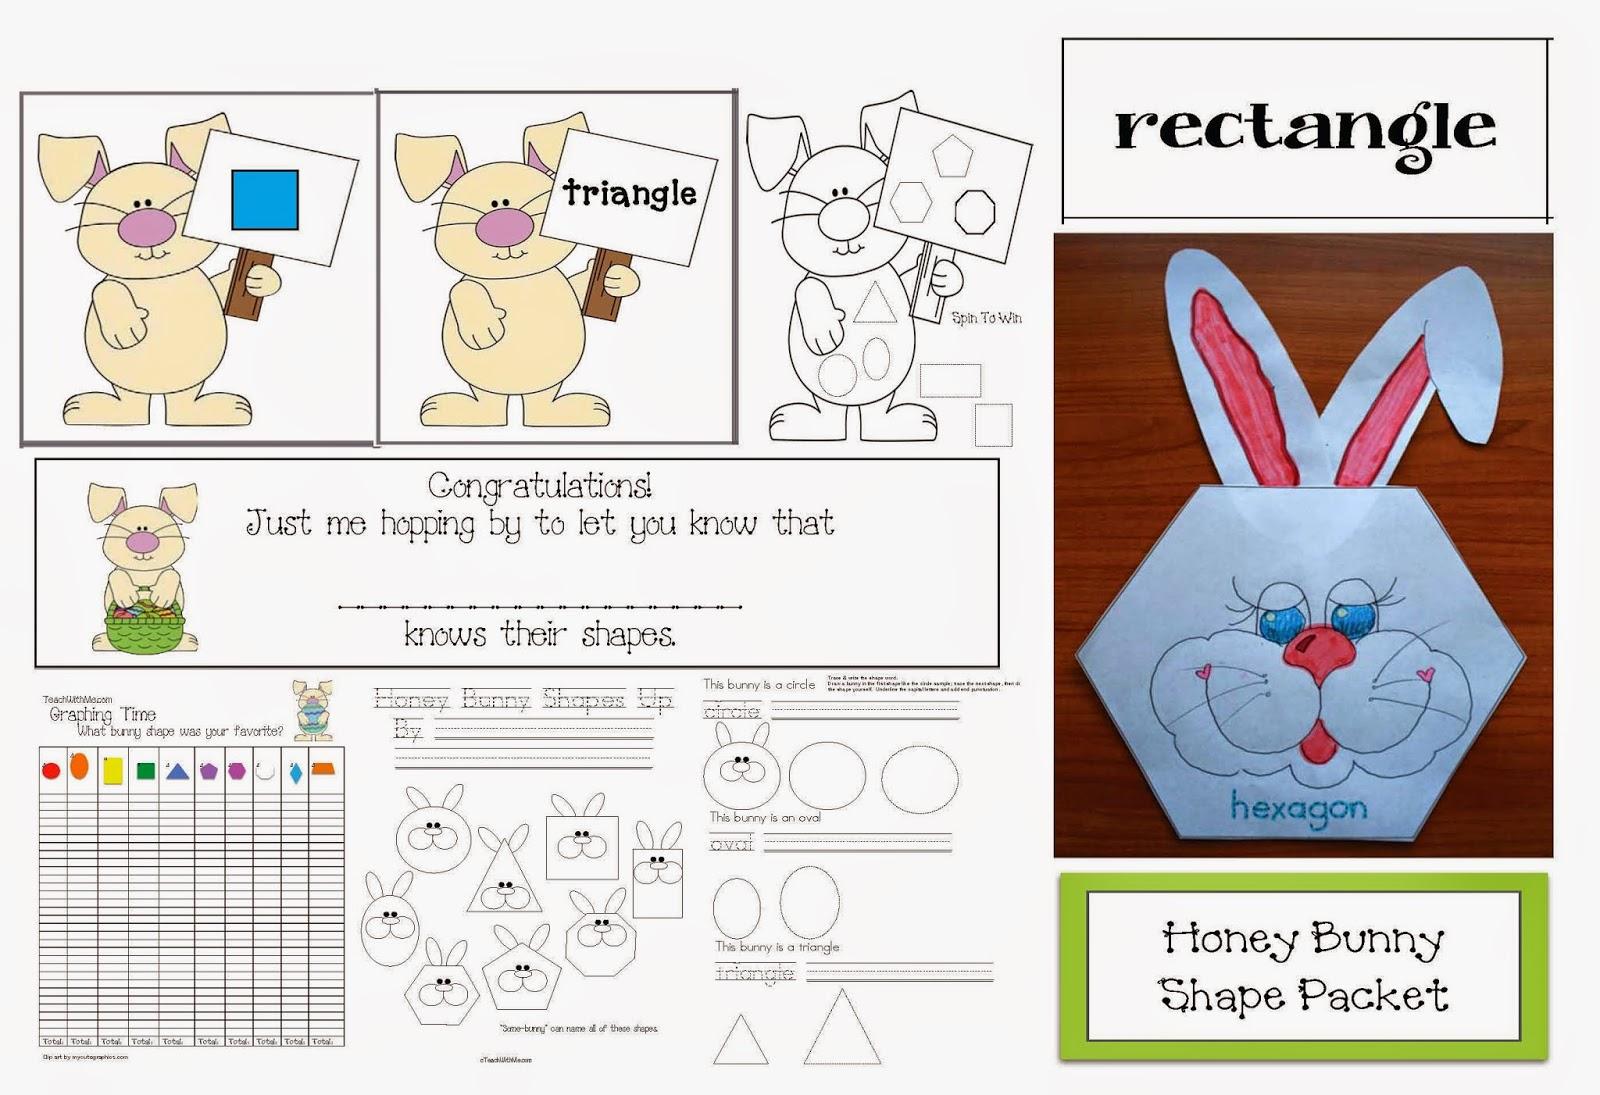 http://1.bp.blogspot.com/-Z53tgl0iNMw/VRG-ncBChJI/AAAAAAAAN3E/lRhSCIeAgdo/s1600/bunny%2Bshape%2Bpacket%2Bcov.jpg